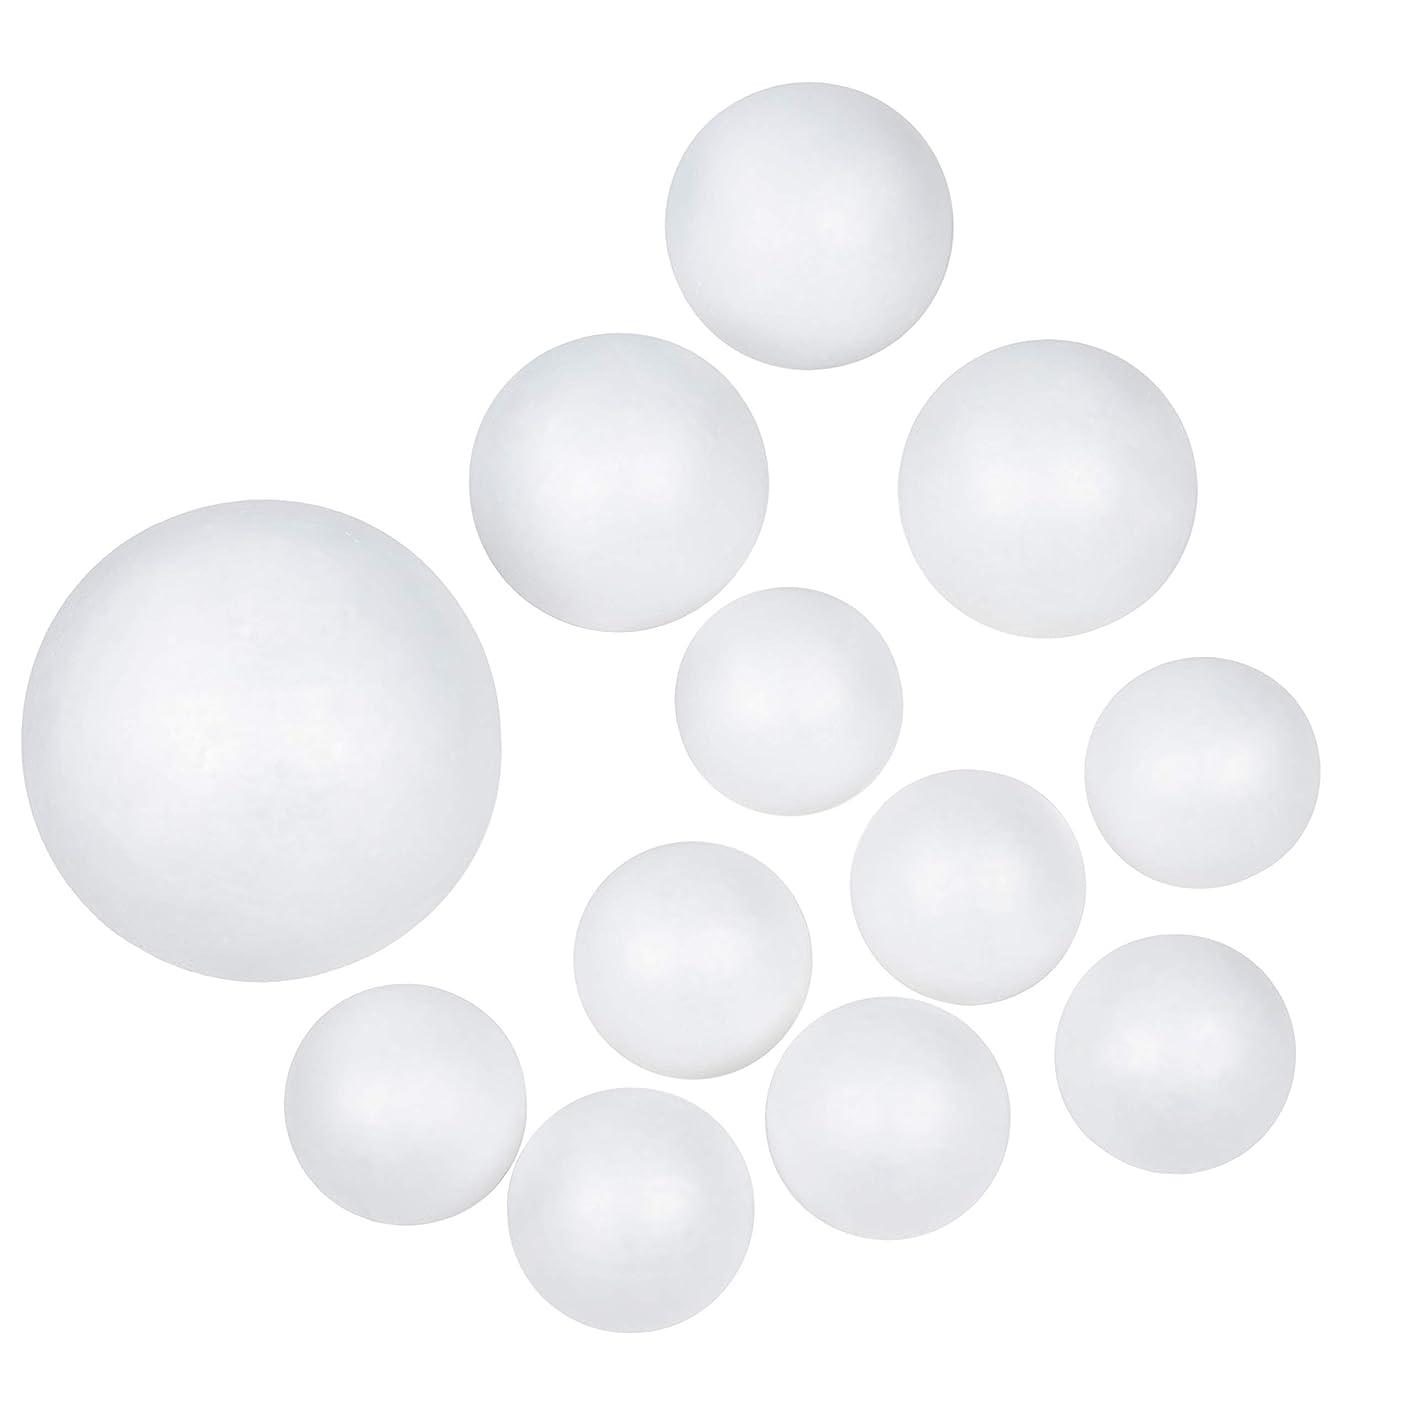 Craft Foam Balls - 12-Piece White Polystyrene Foam Balls for DIY Craft and Modeling, 3-Inch, 4-Inch, 6-Inch